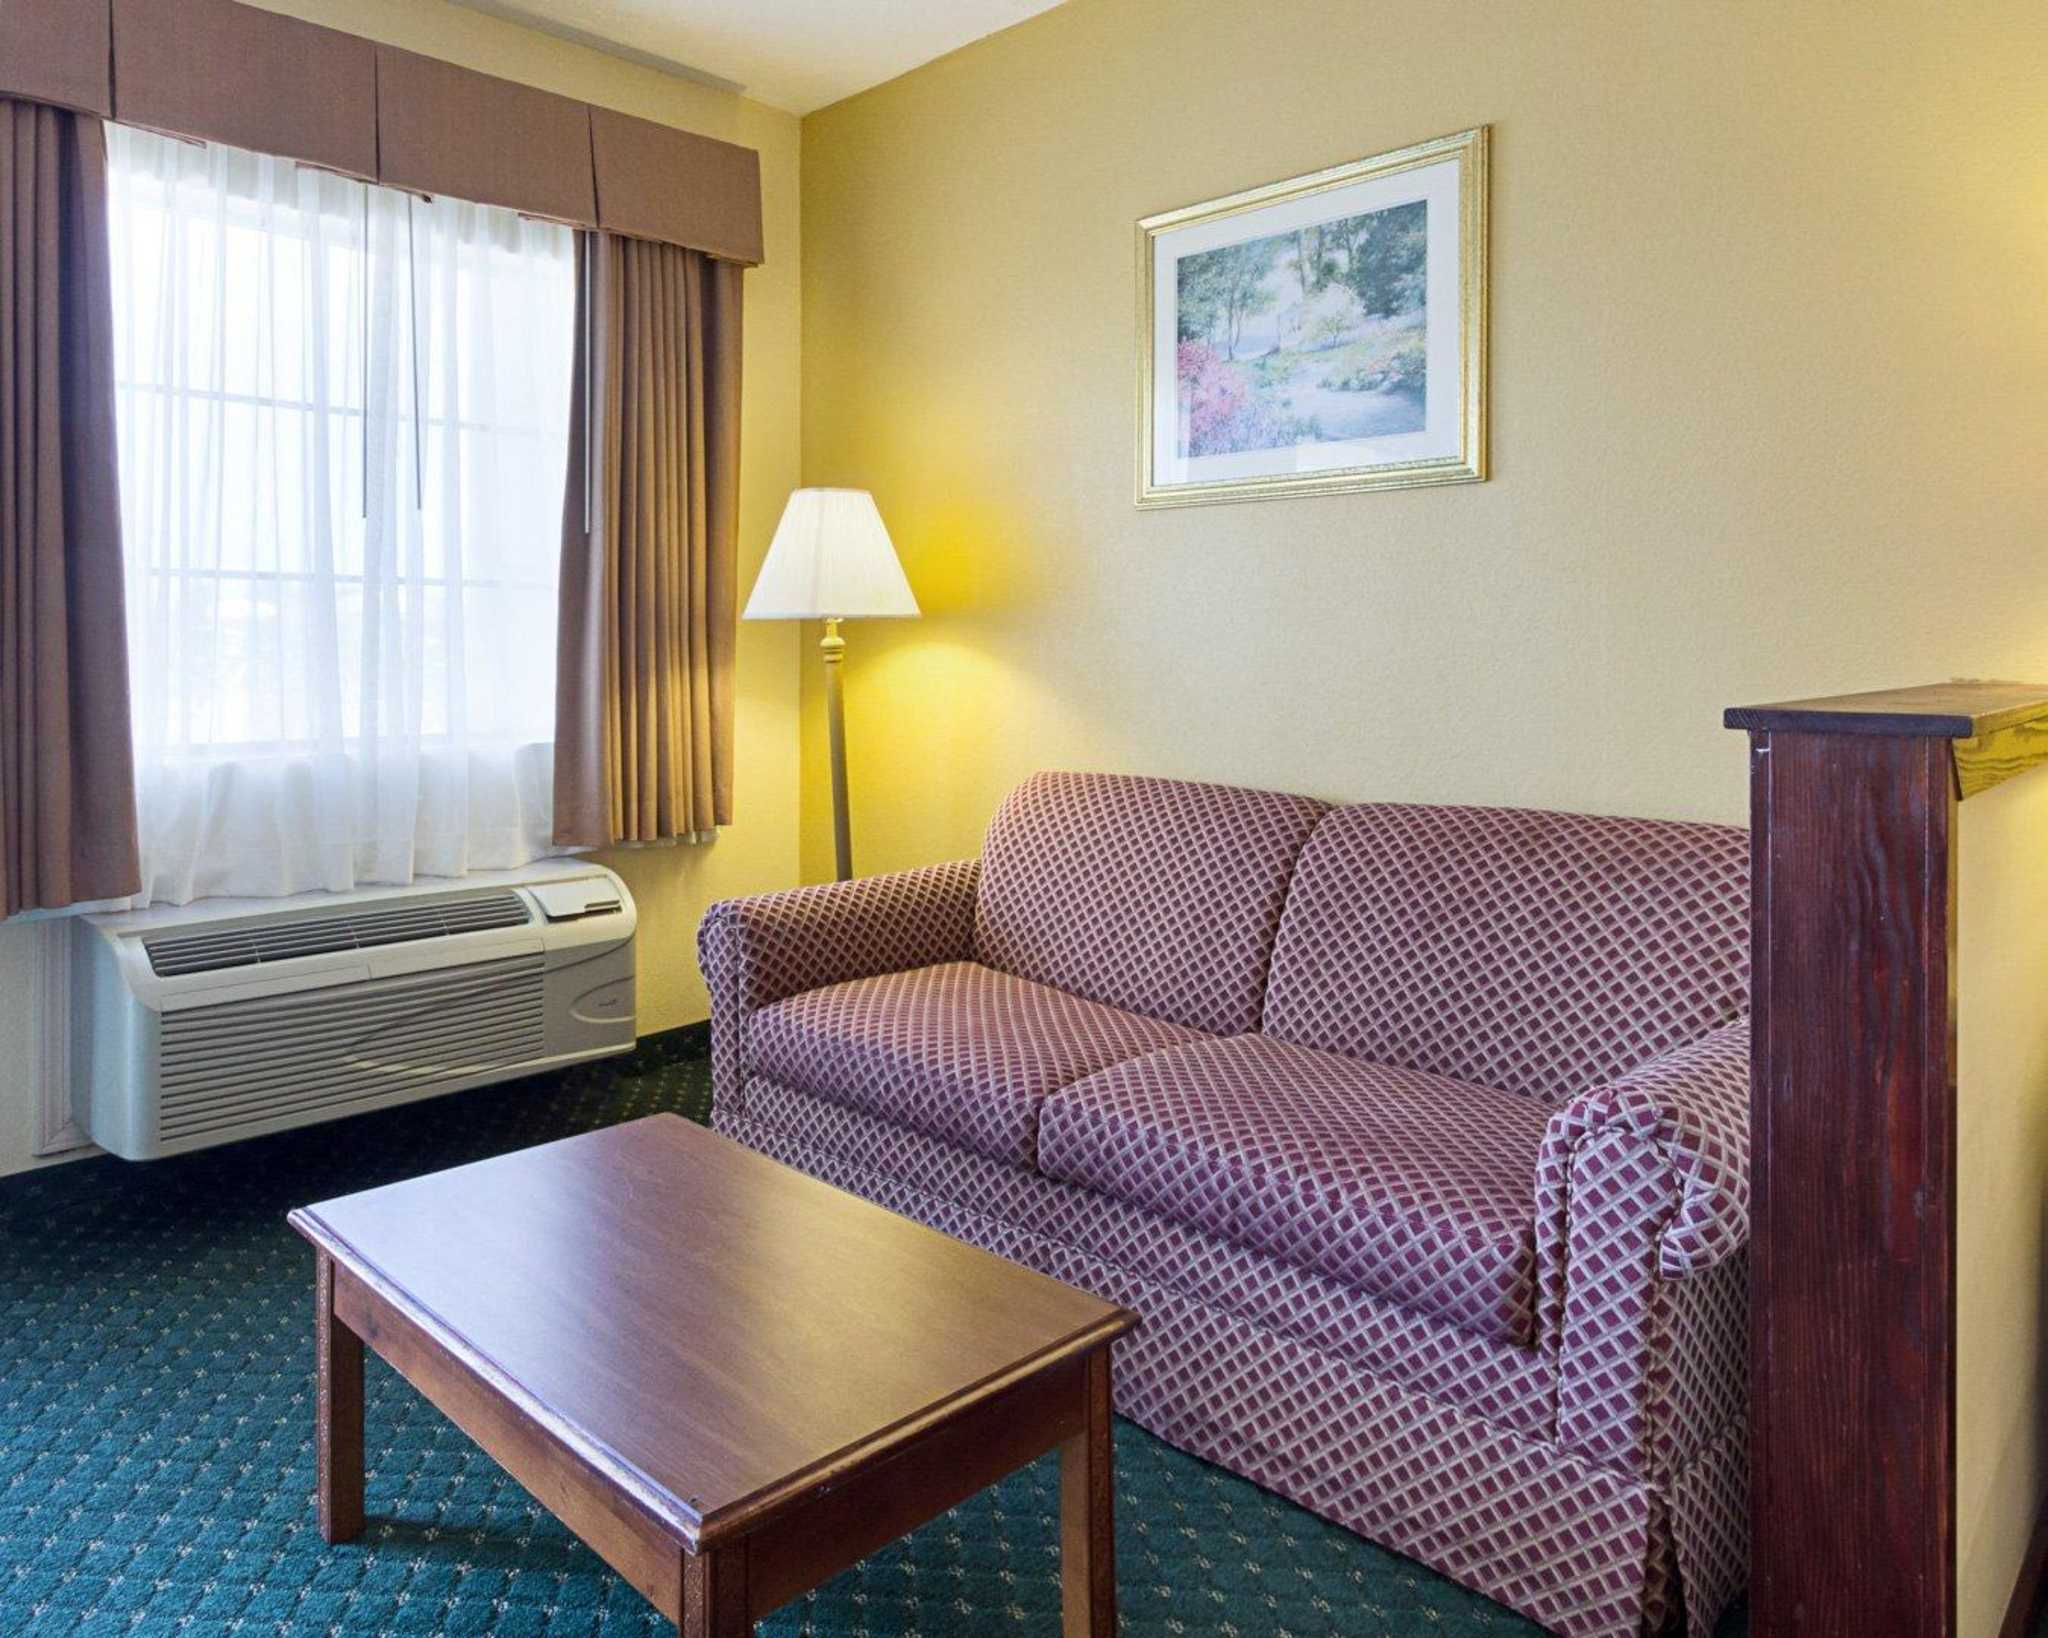 Quality Inn & Suites Southwest image 28